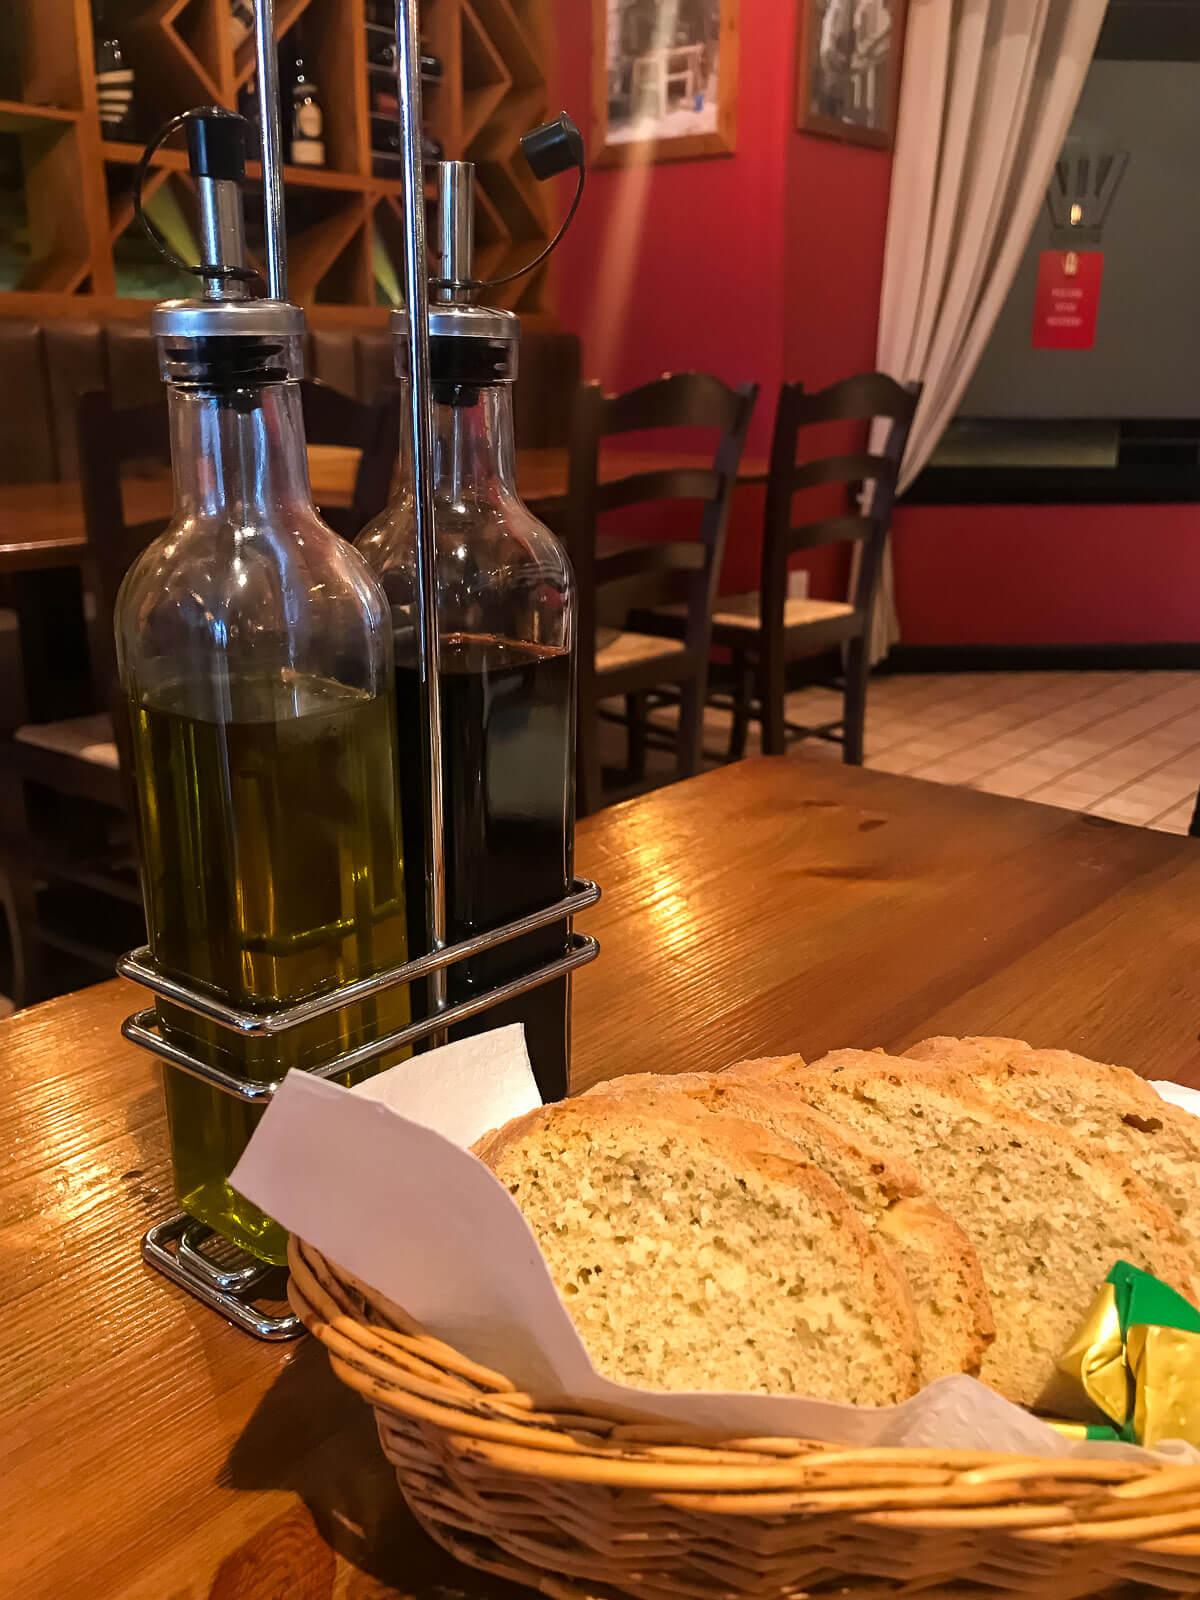 Bread and Oil at Aperitivo